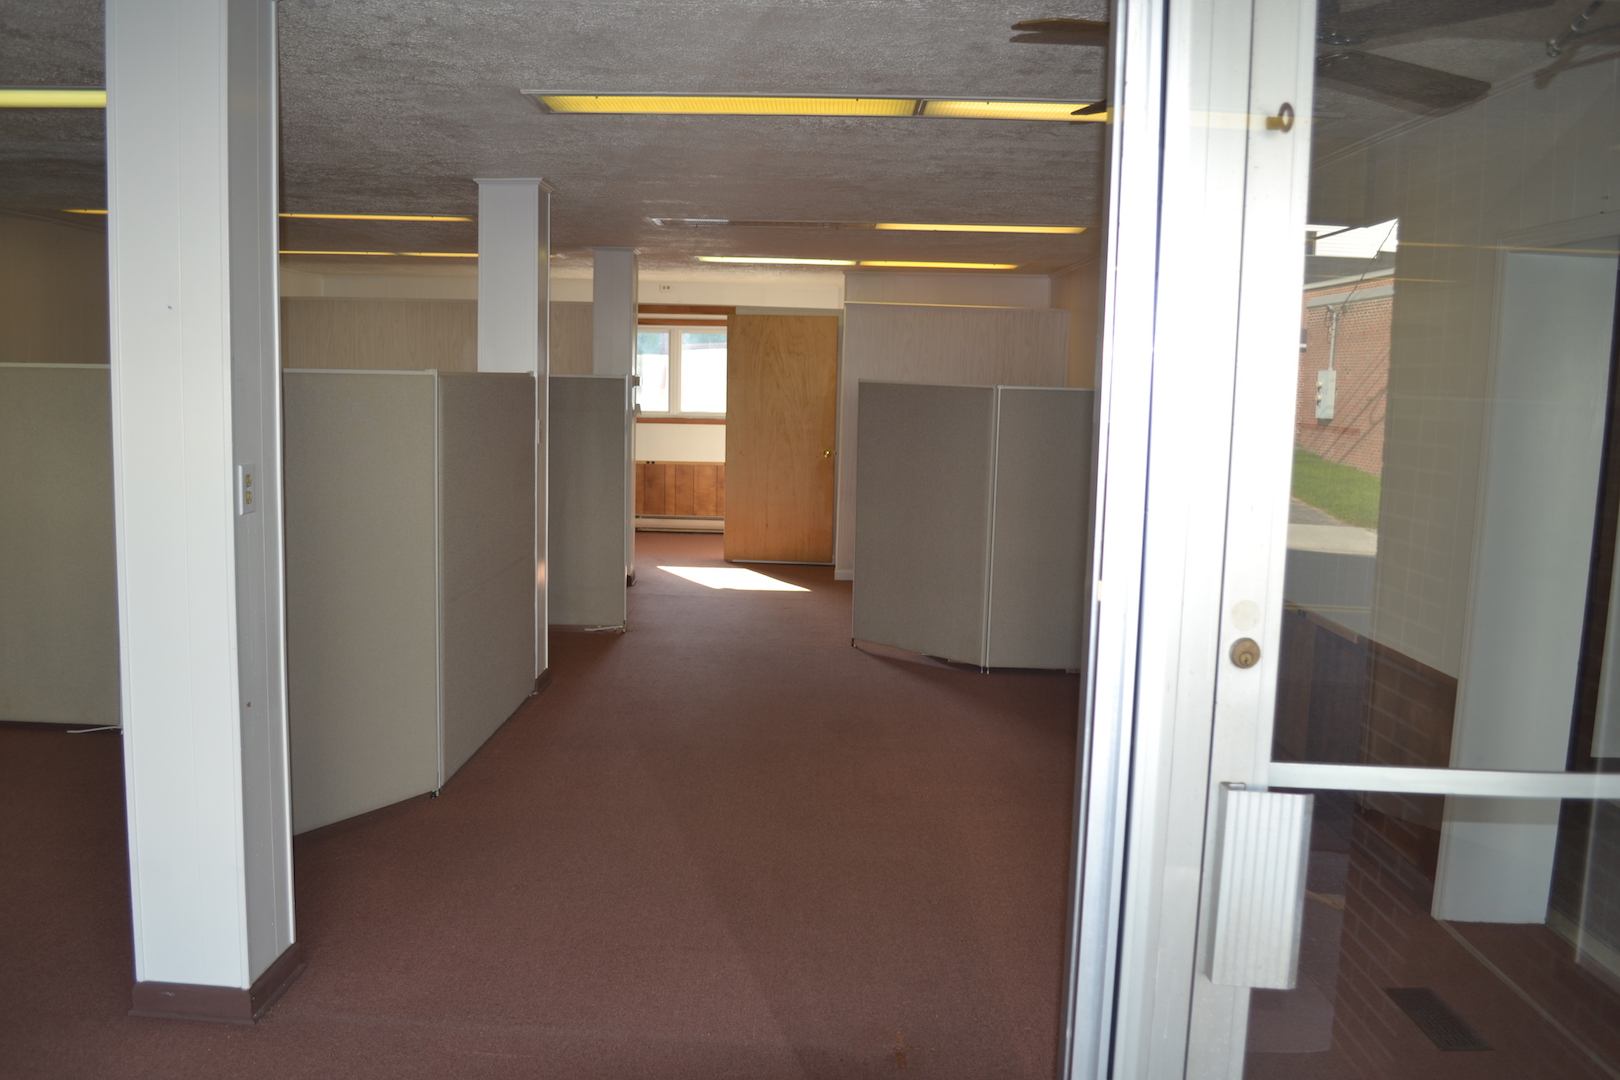 7-First Floor-Main Office Space-1.JPG